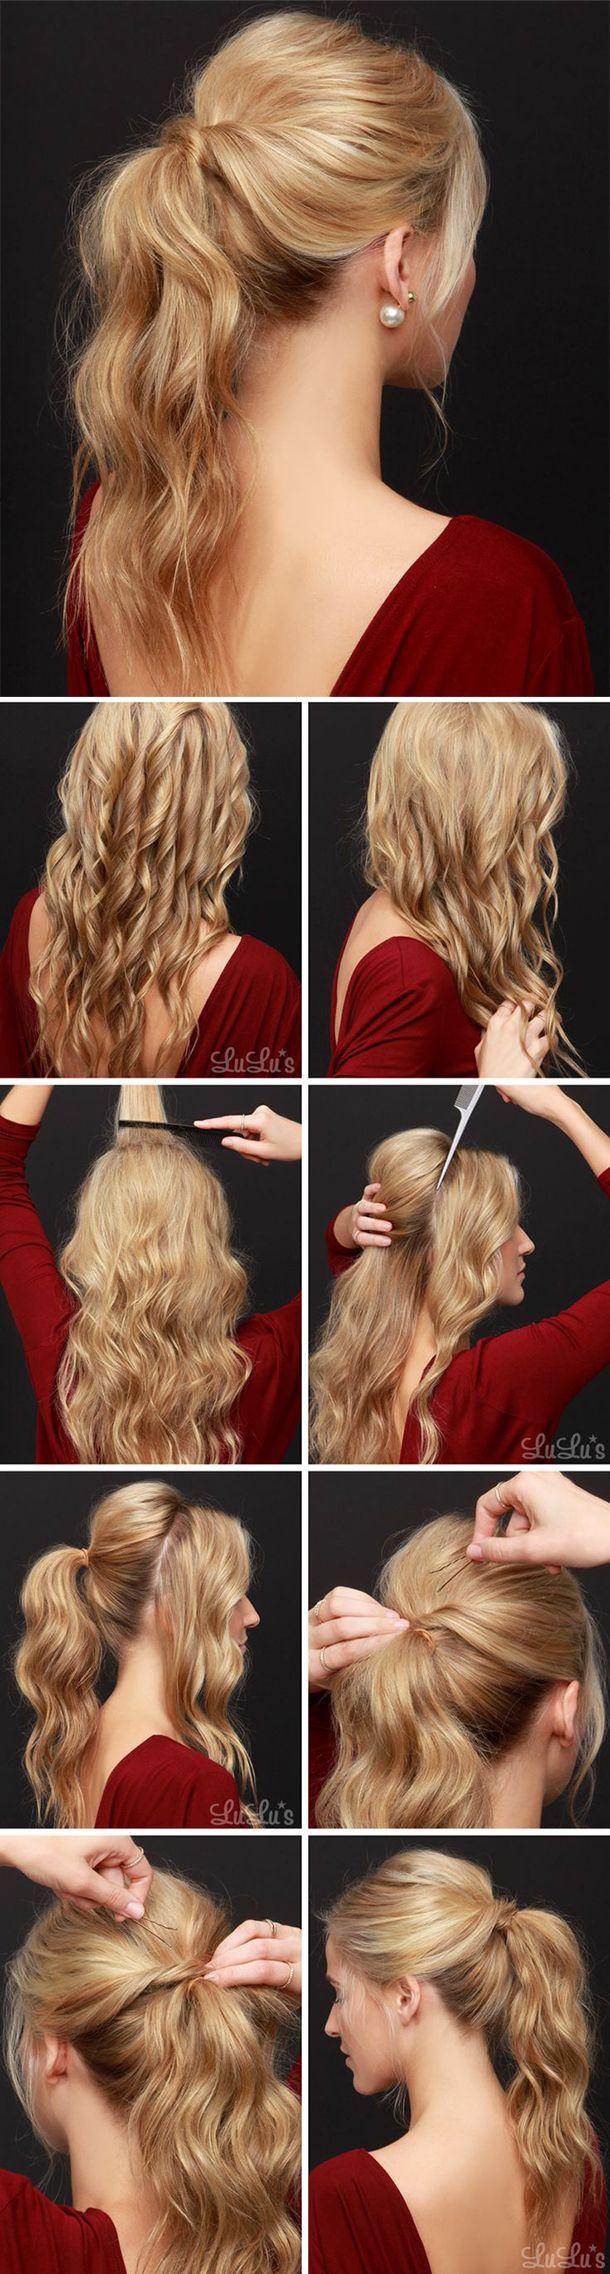 Bcbcefdeedbbdc belleza pinterest hair style